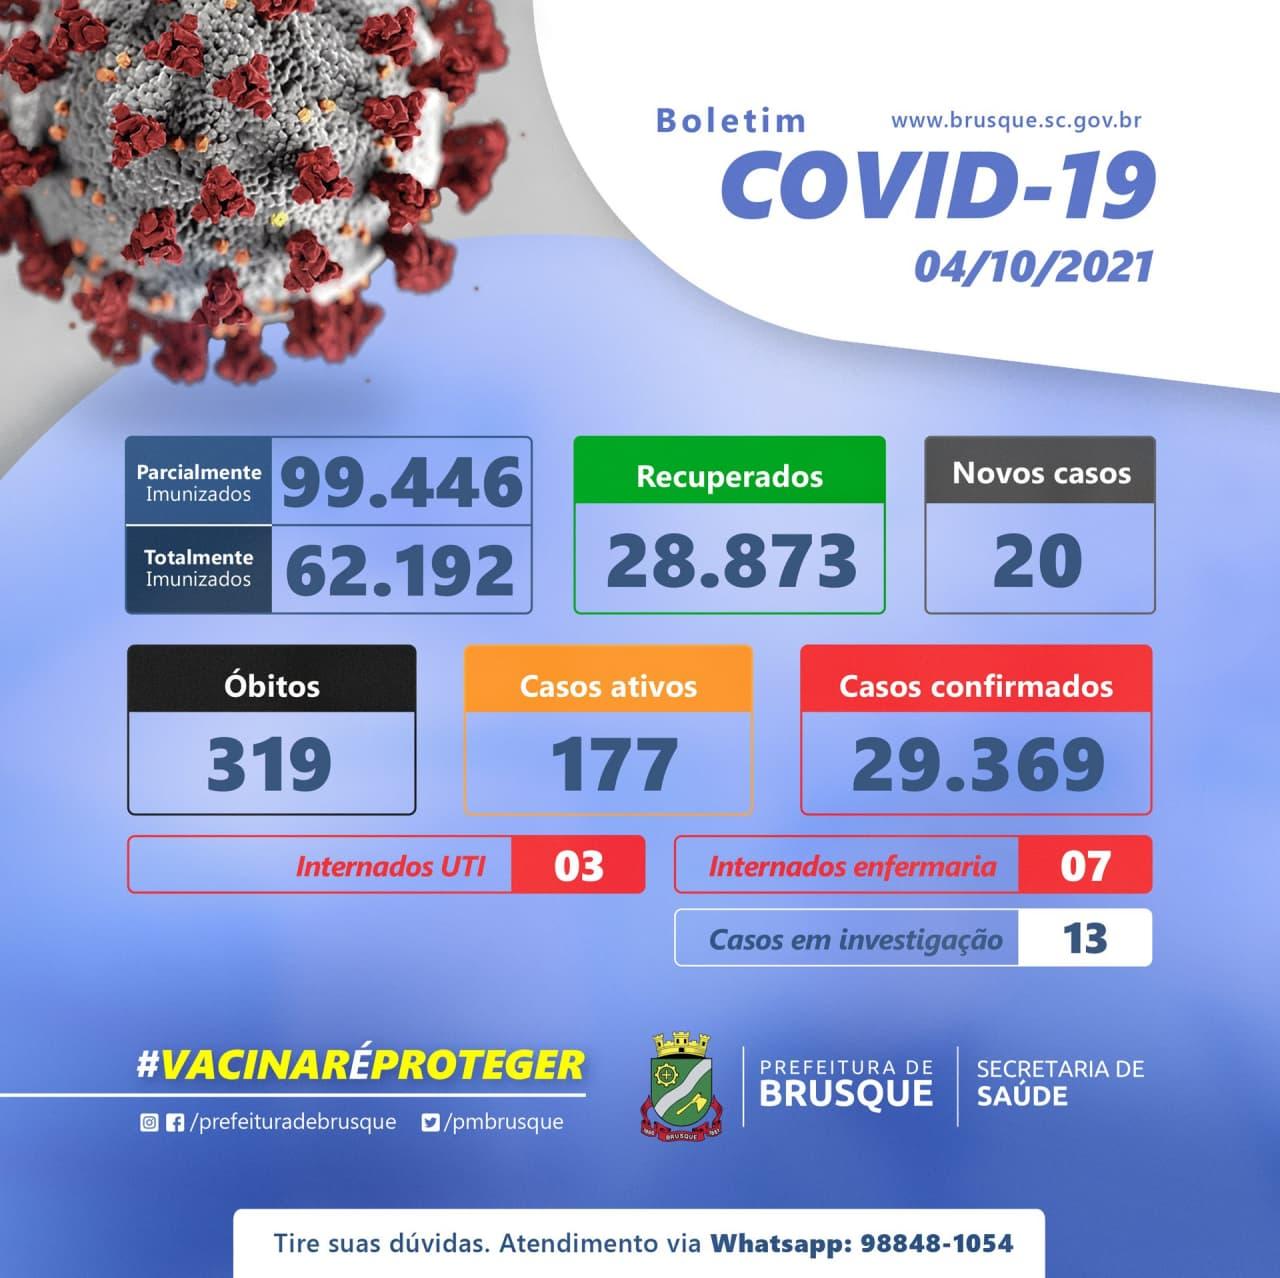 Covid-19: Confira o boletim epidemiológico desta segunda-feira (04)